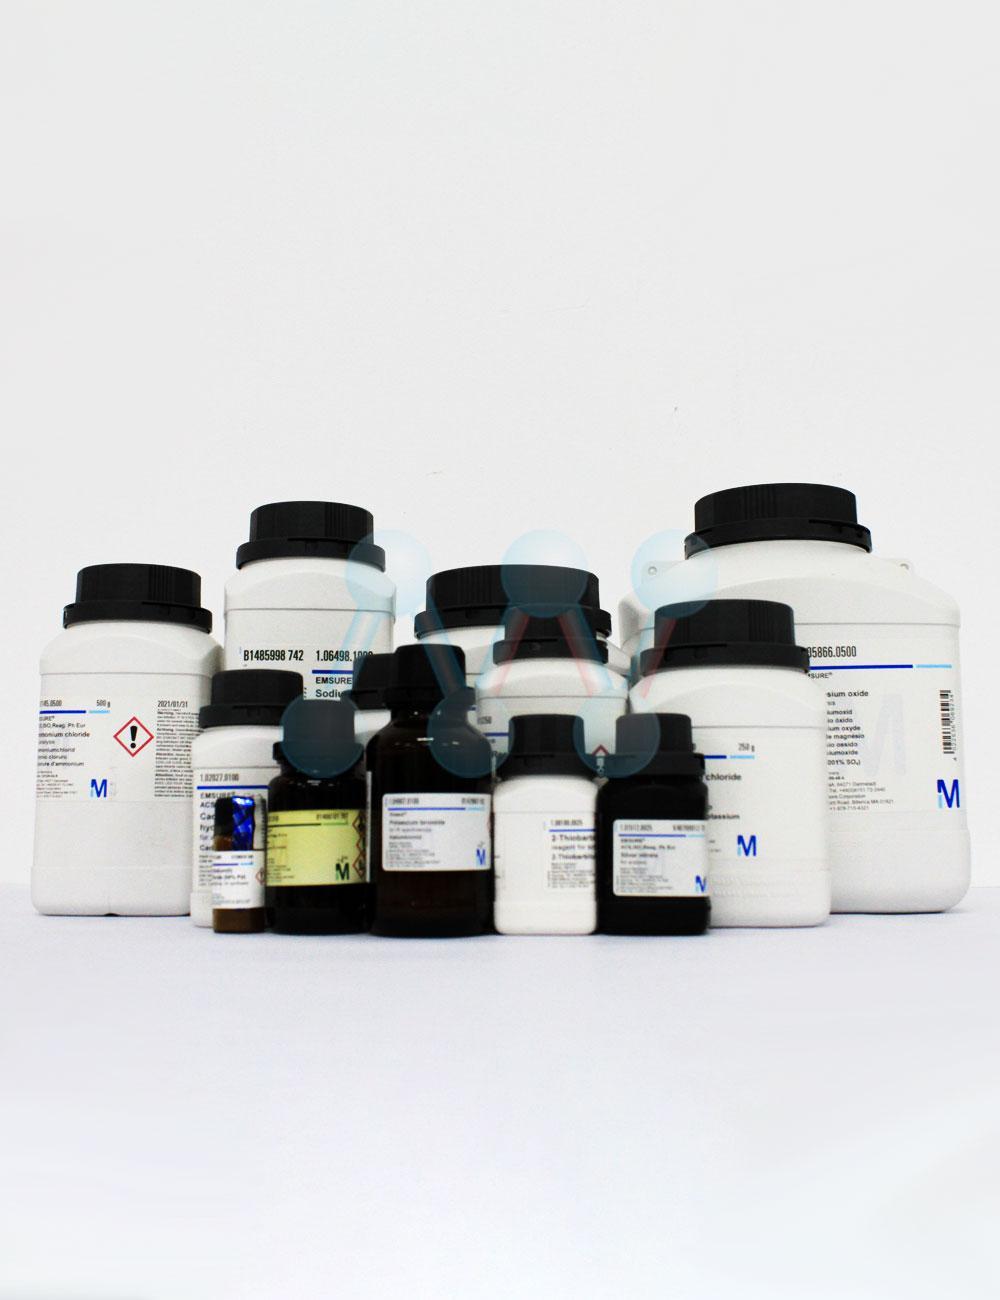 di-Potassium Hydrogen Phosphate Trihydrate K2HPO4.3H2O